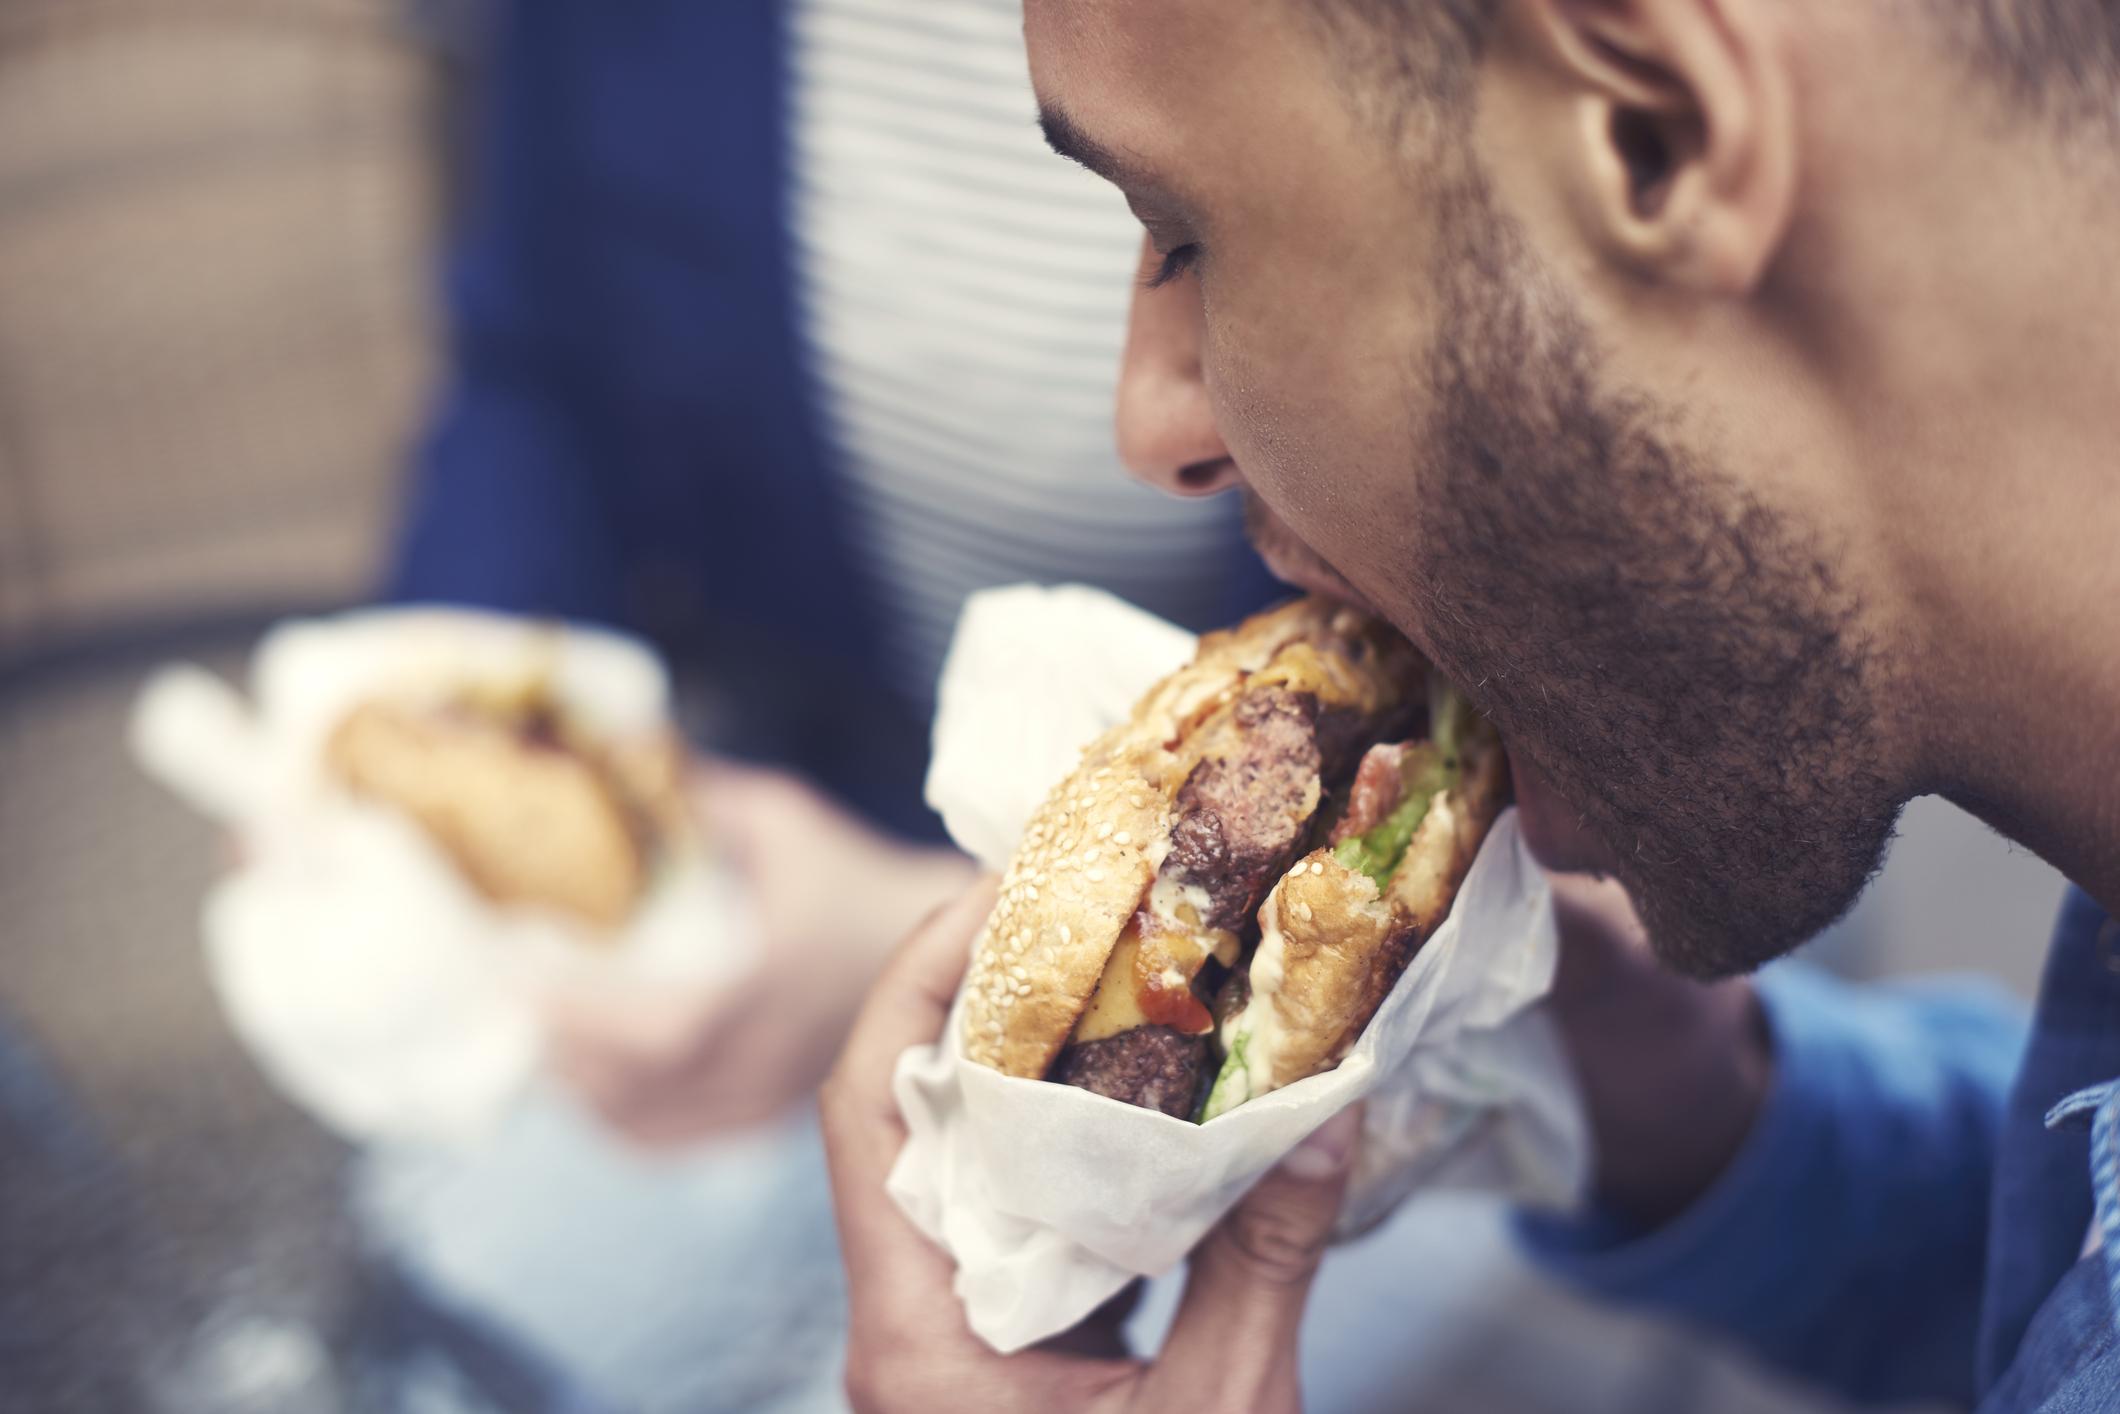 A man taking a bite of a cheeseburger.